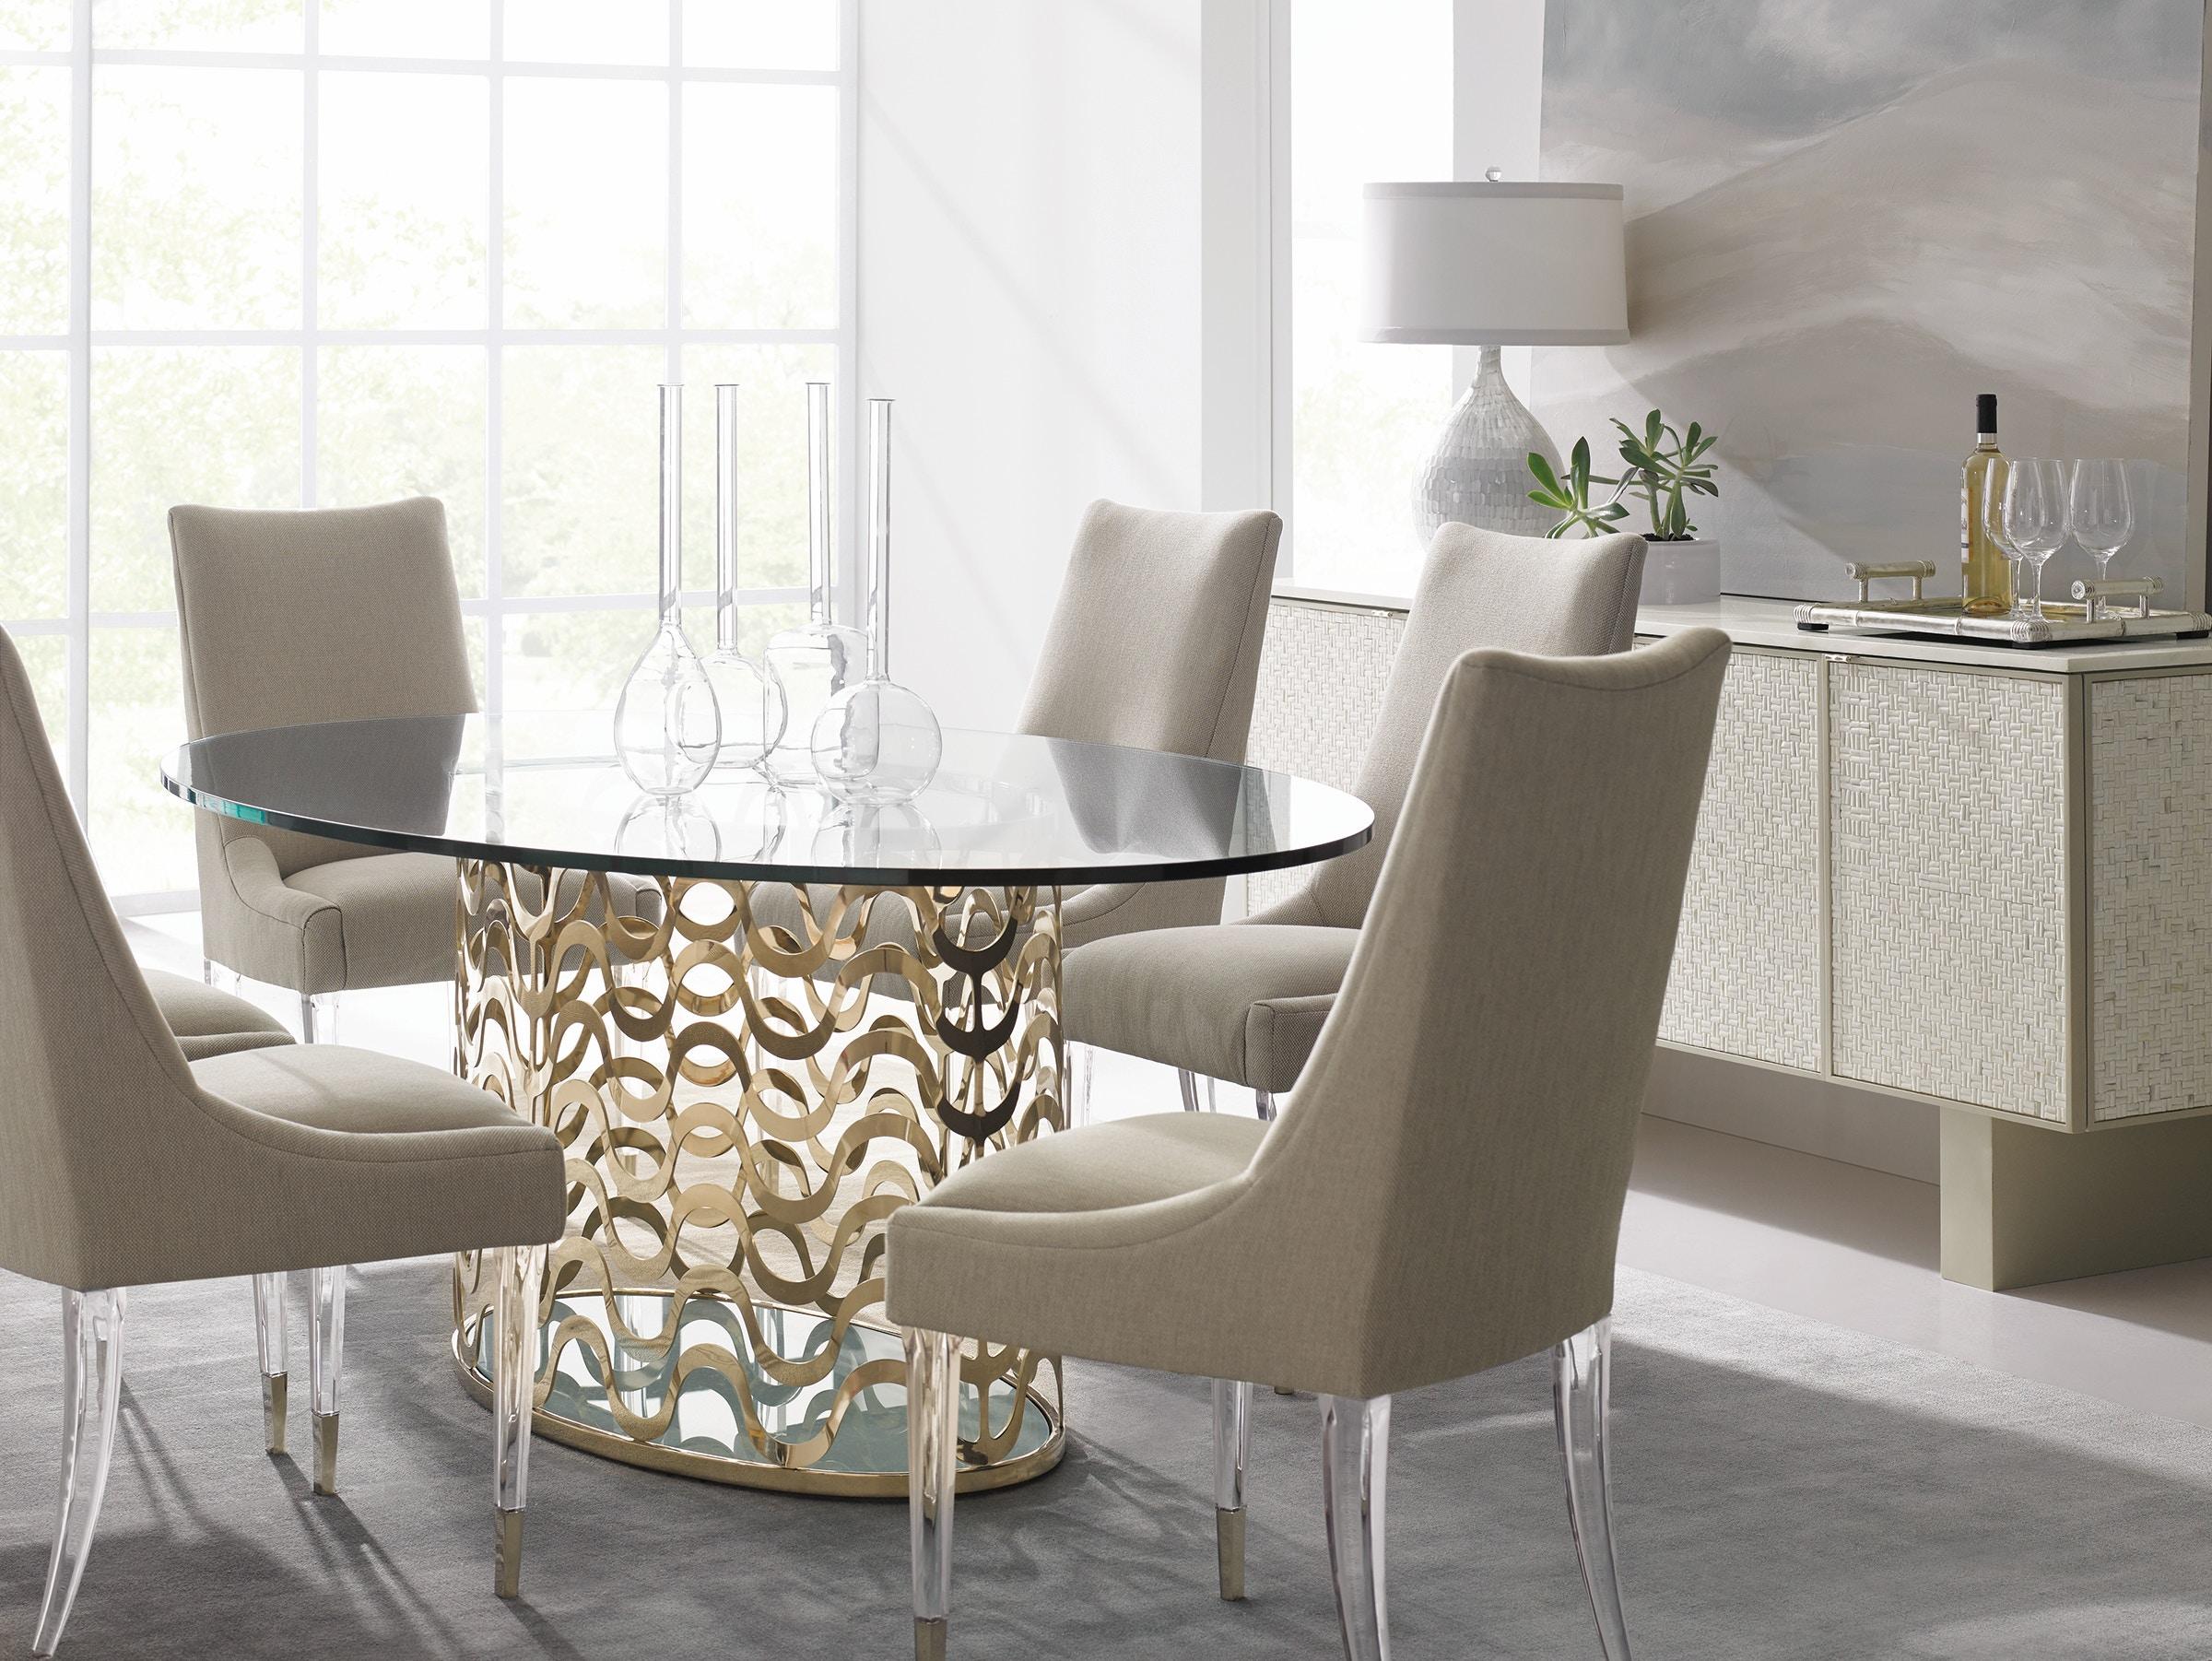 caracole dining room wavelength cla 416 203 kalin home caracole wavelength cla 416 203